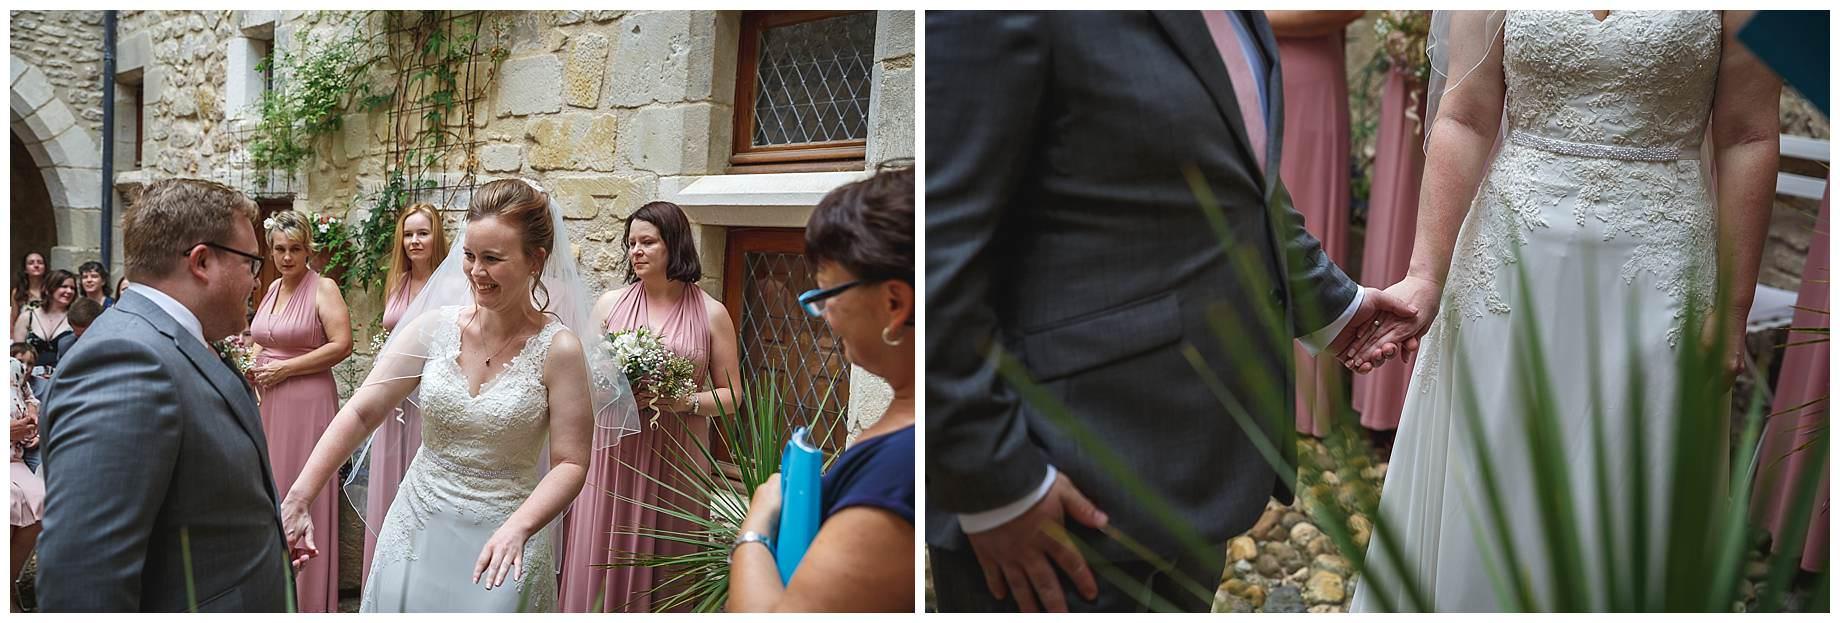 wedding at Chateau Brametourte